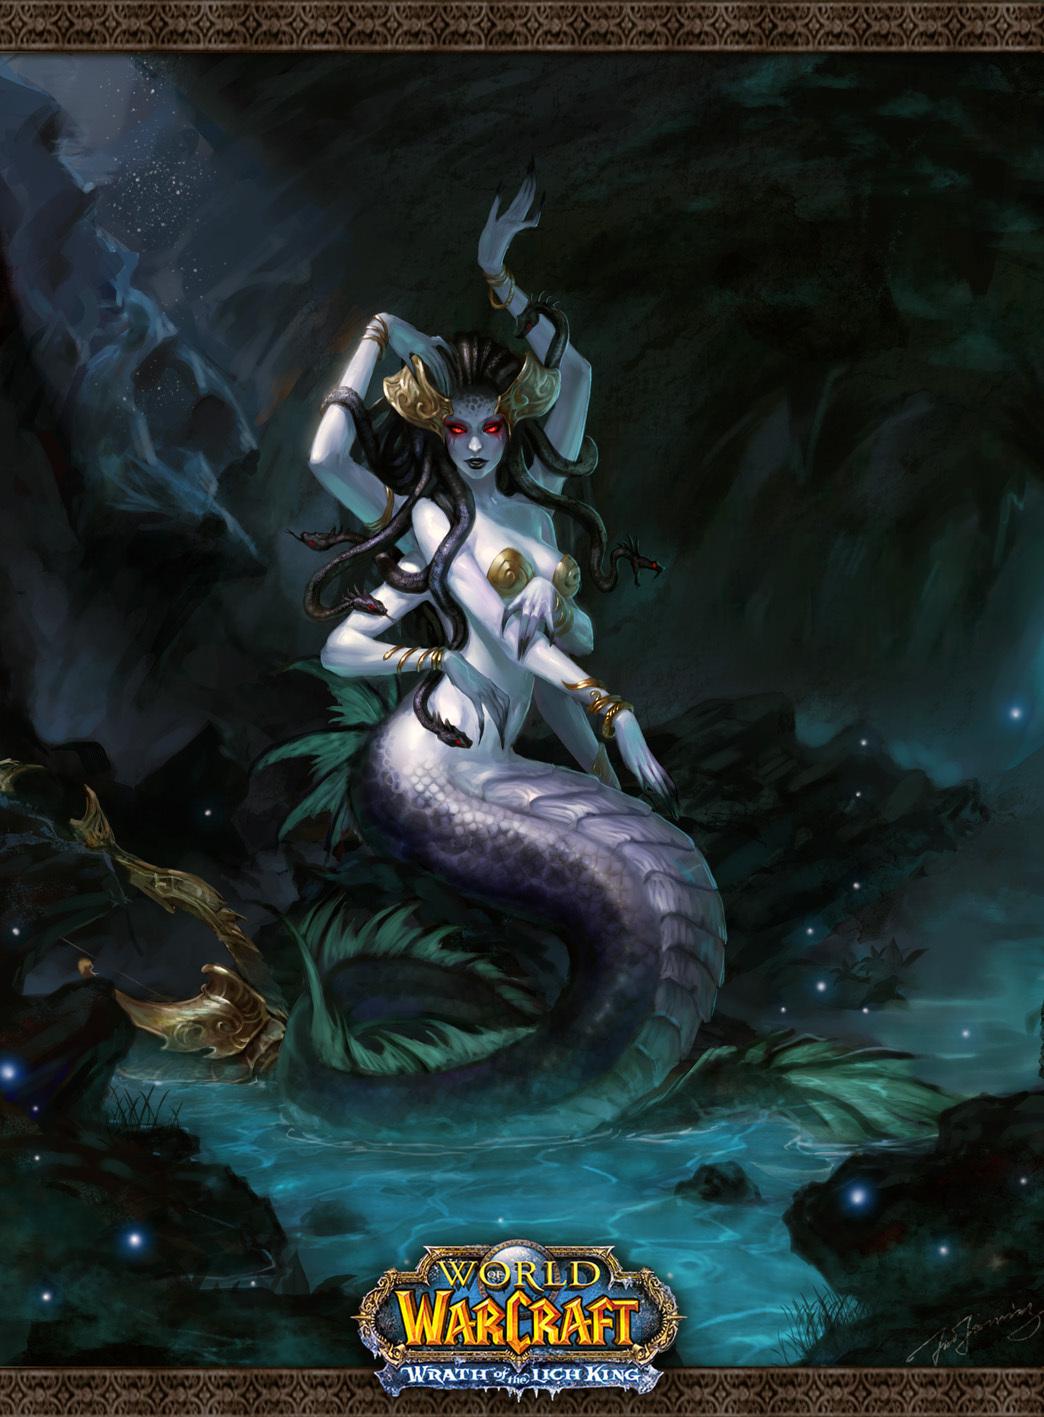 Warcraft hent image hd pron pics